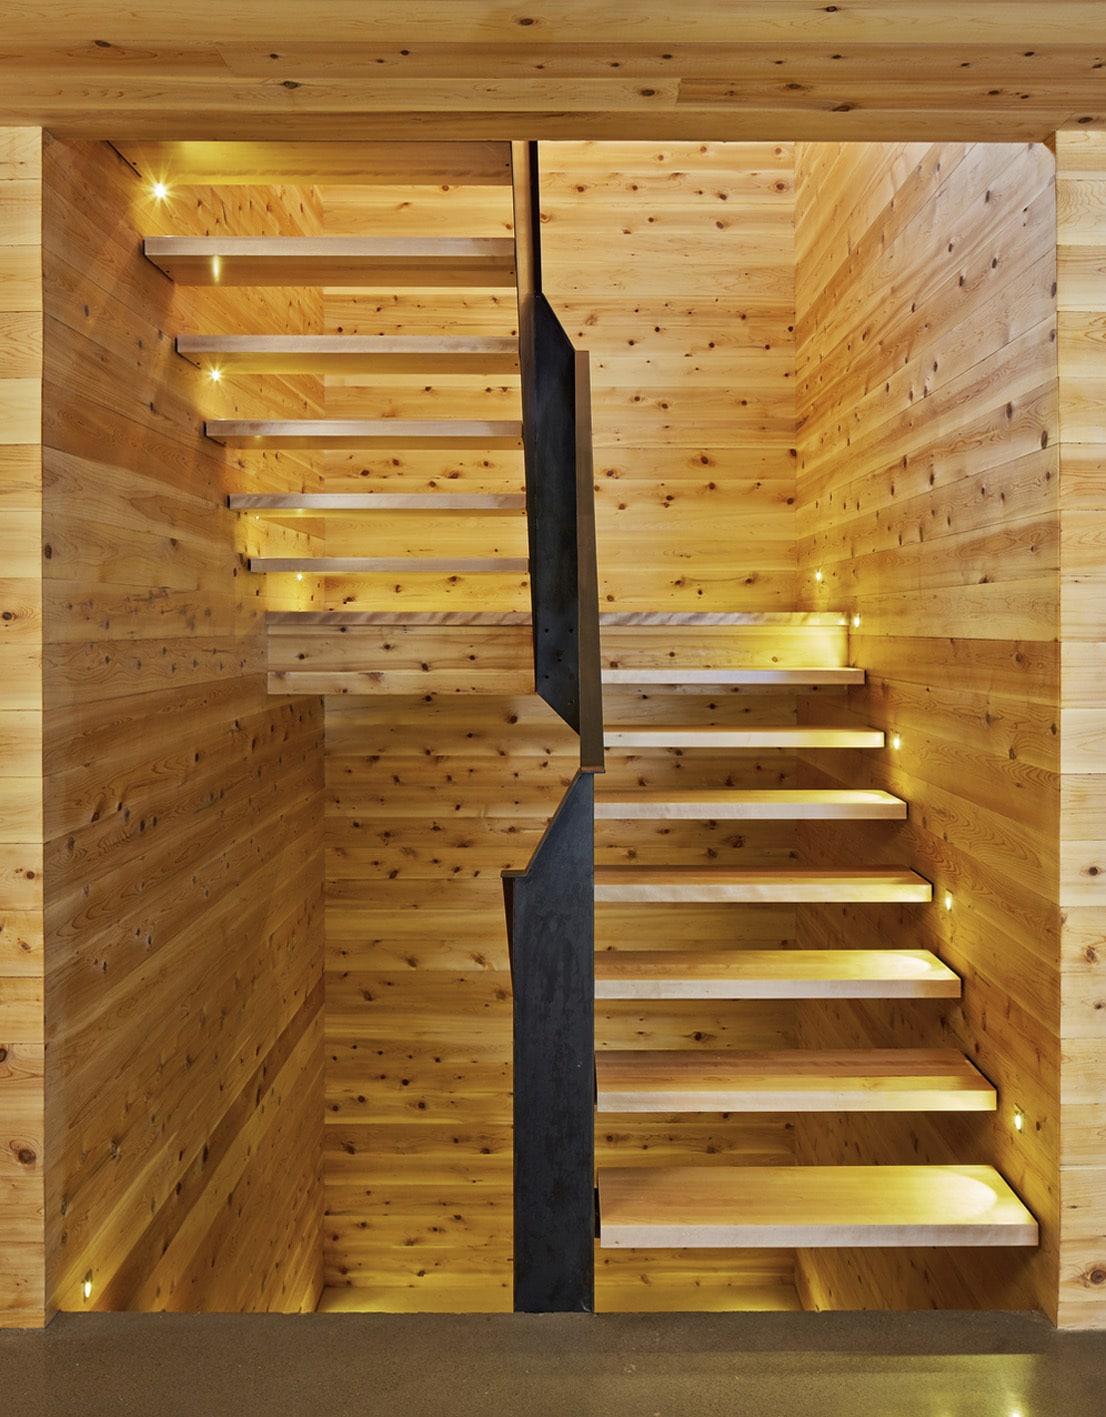 Dise o de moderna escalera de madera 2 construye hogar - Escaleras de madera modernas ...